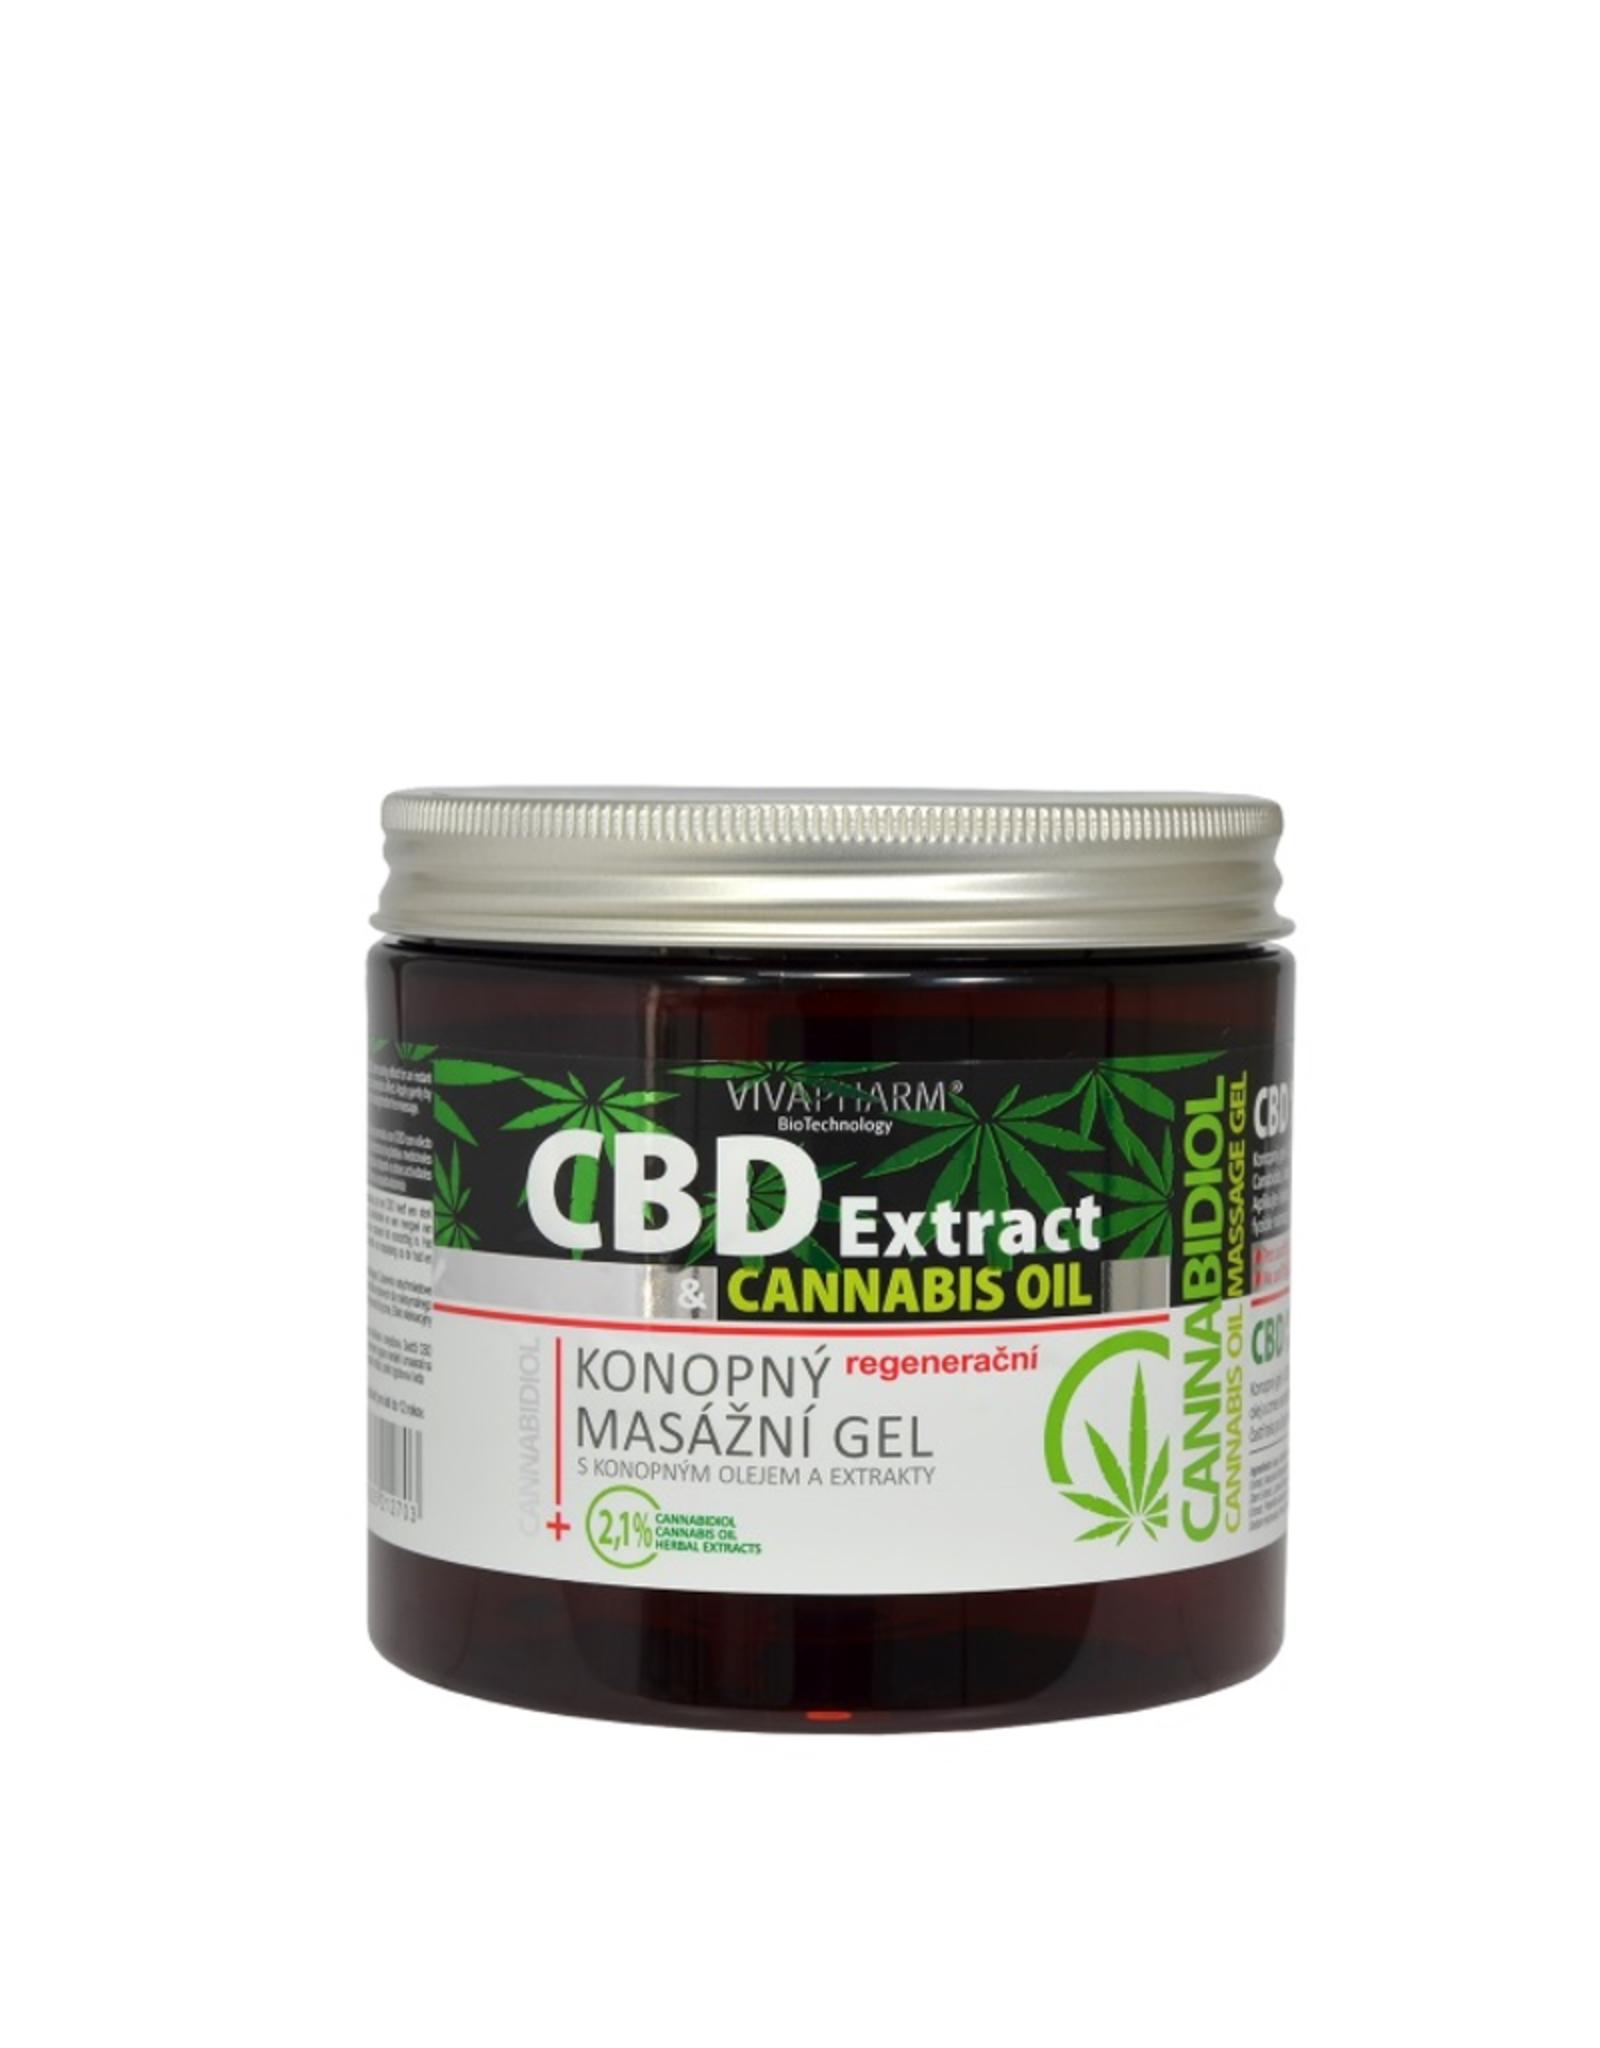 VIVAPHARM®   CBD Cannabis Massage Gel met Cannabisolie